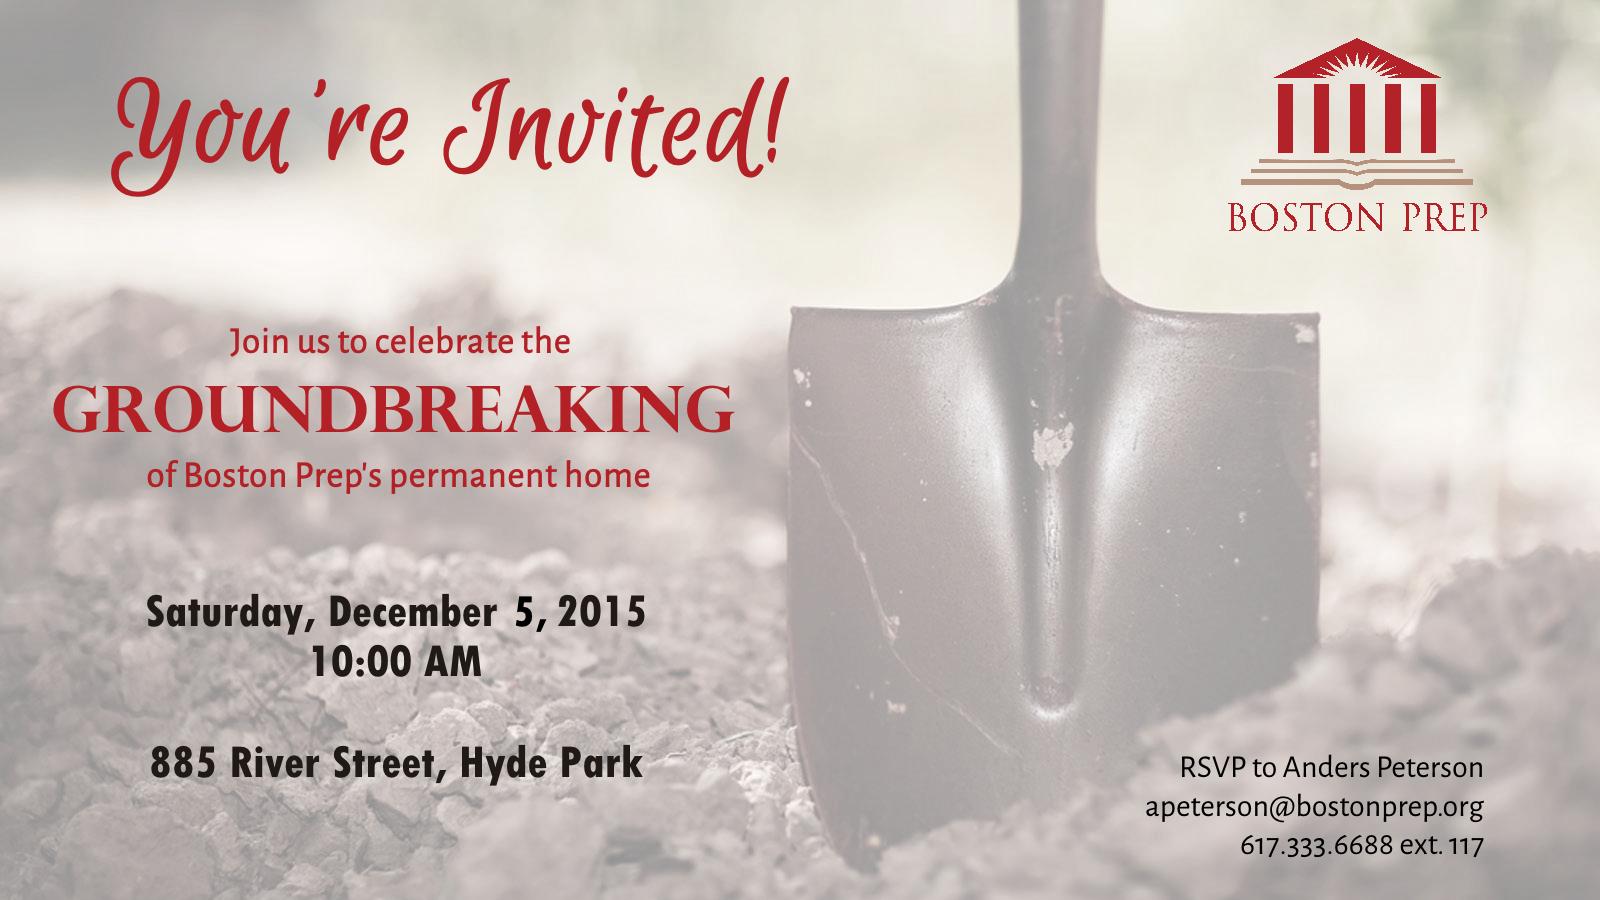 Groundbreaking invite.png